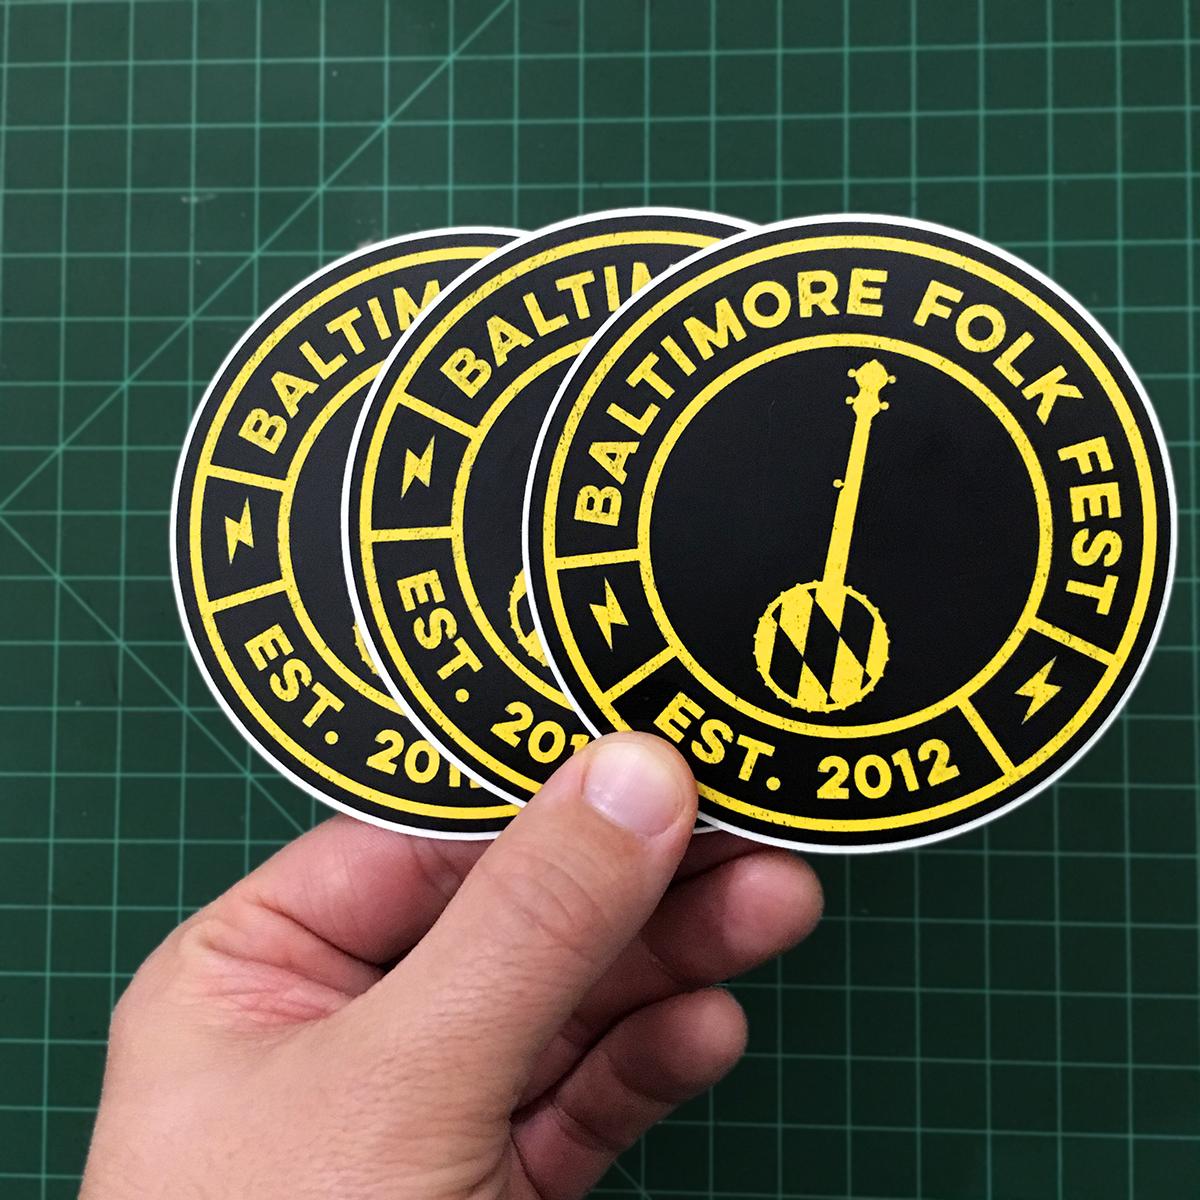 BaltimoreFolk_stickers.jpg